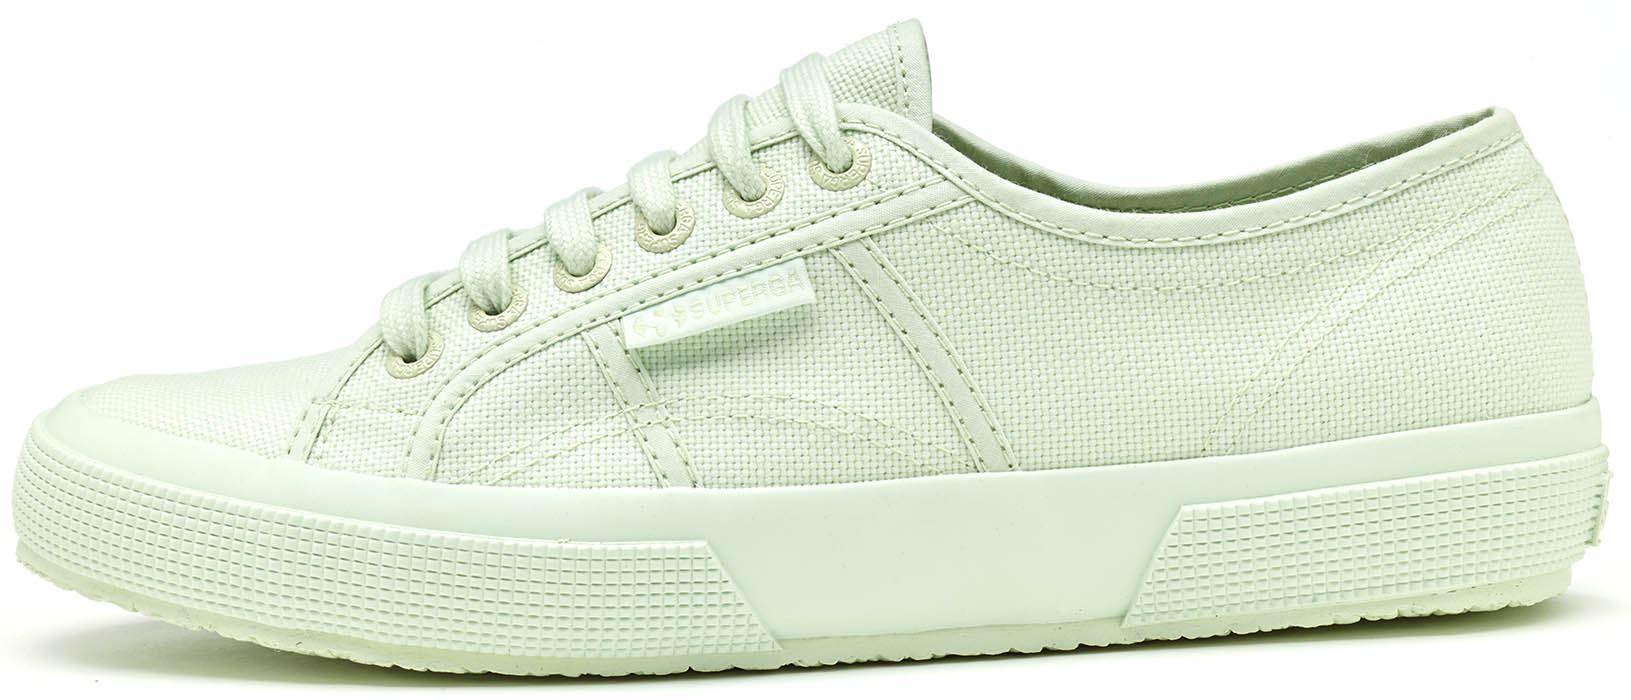 Superga 2750 Cotu Classic Shoes 41 EU Beige oleDmA